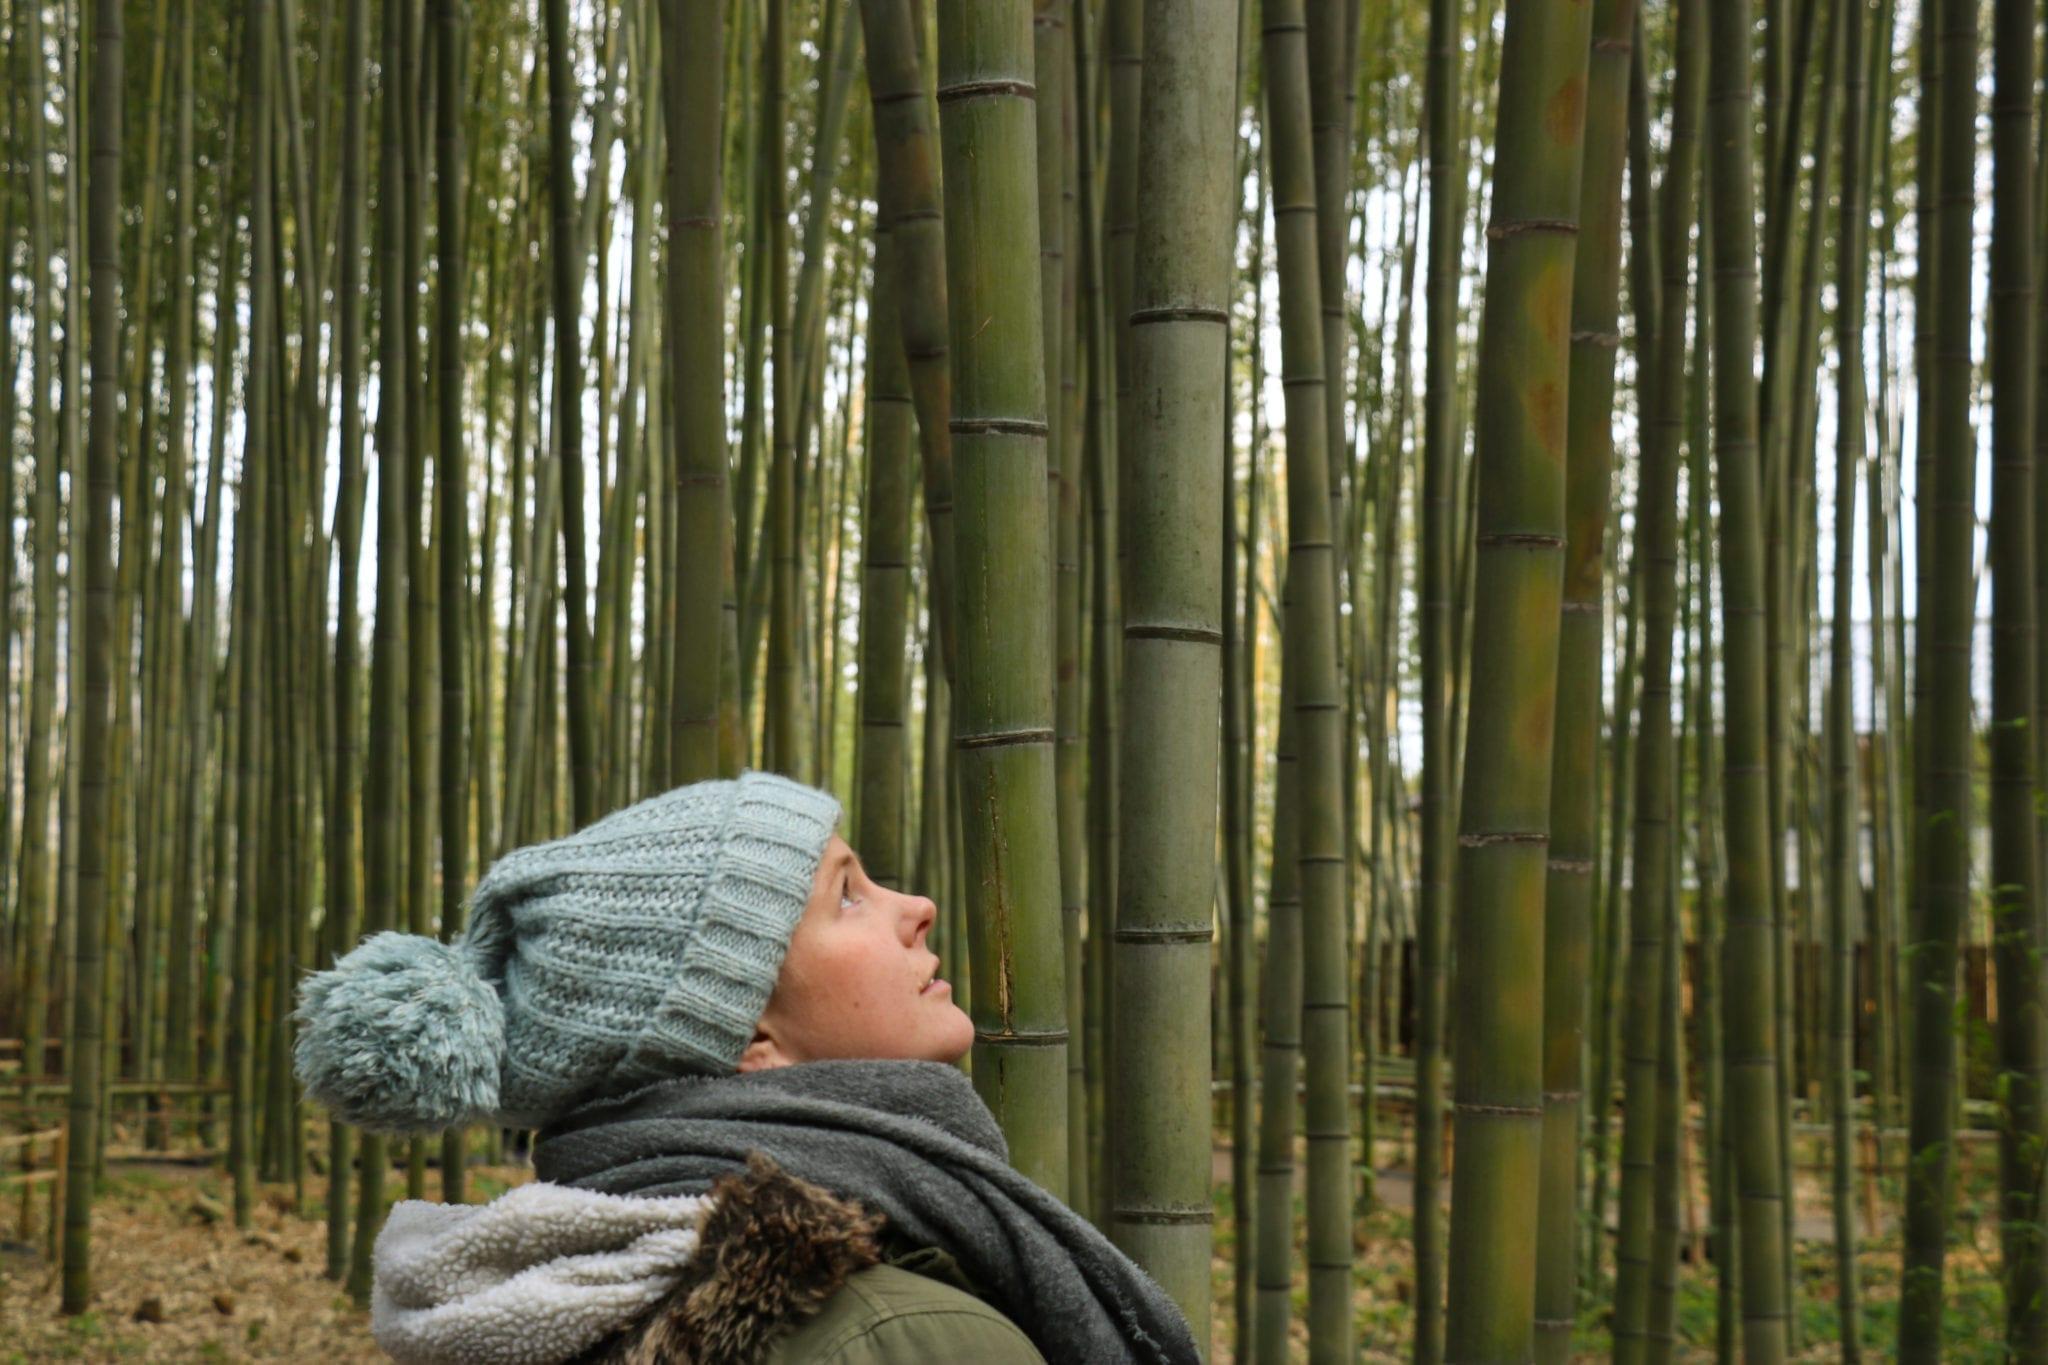 About - Emma Jane Explores - Solo Female Travel